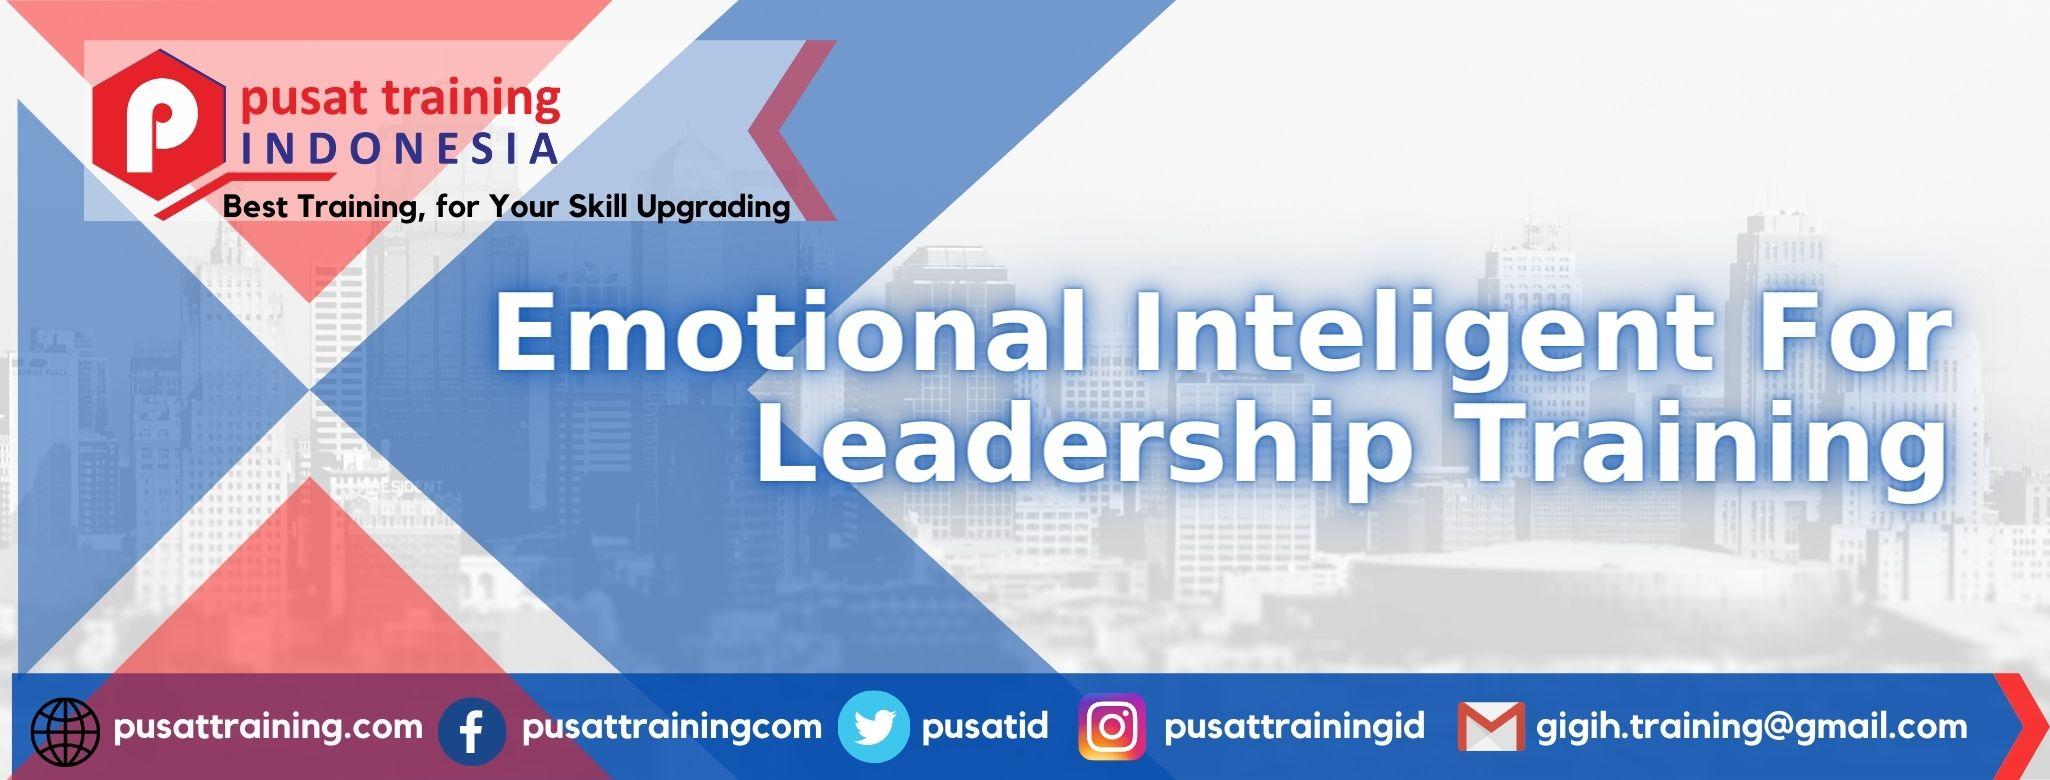 Training-Emotional-Inteligent-For-Leadership